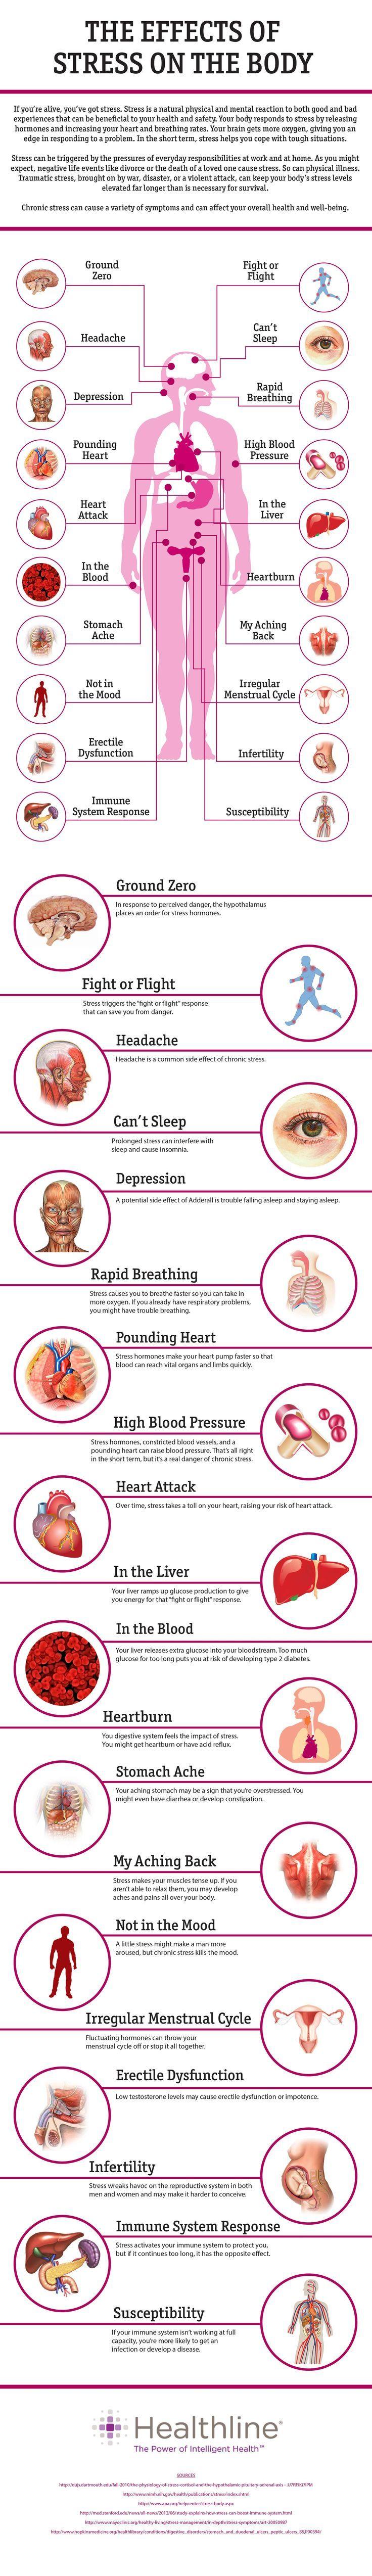 The Effects of Stress on Your Body   Gesundheit, Ratgeber gesundheit ...